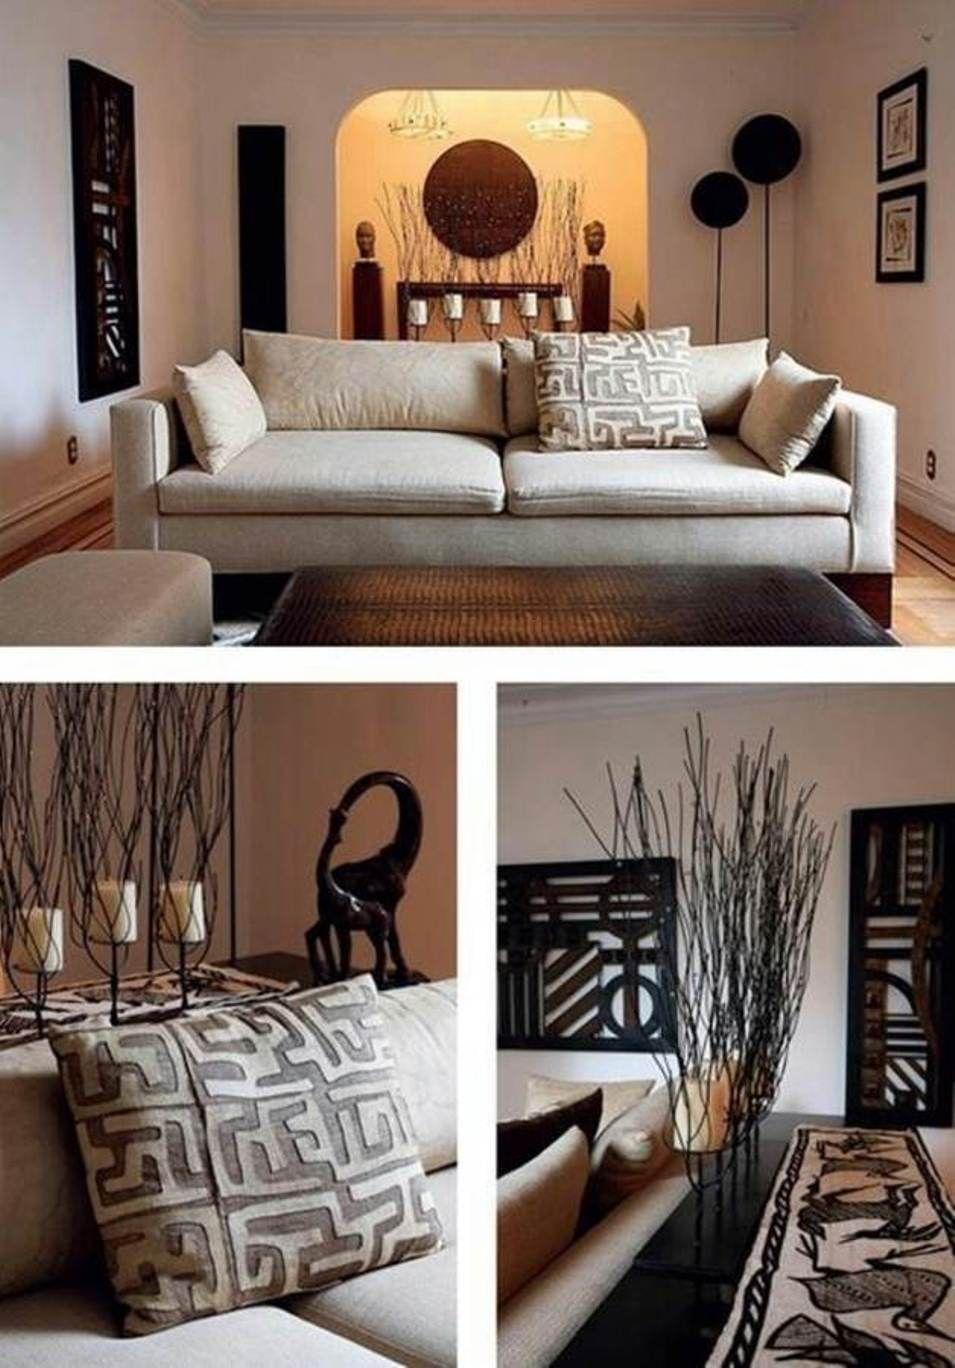 South african decorating ideas home decor inspiration room living rooms also meraki interior rh ar pinterest